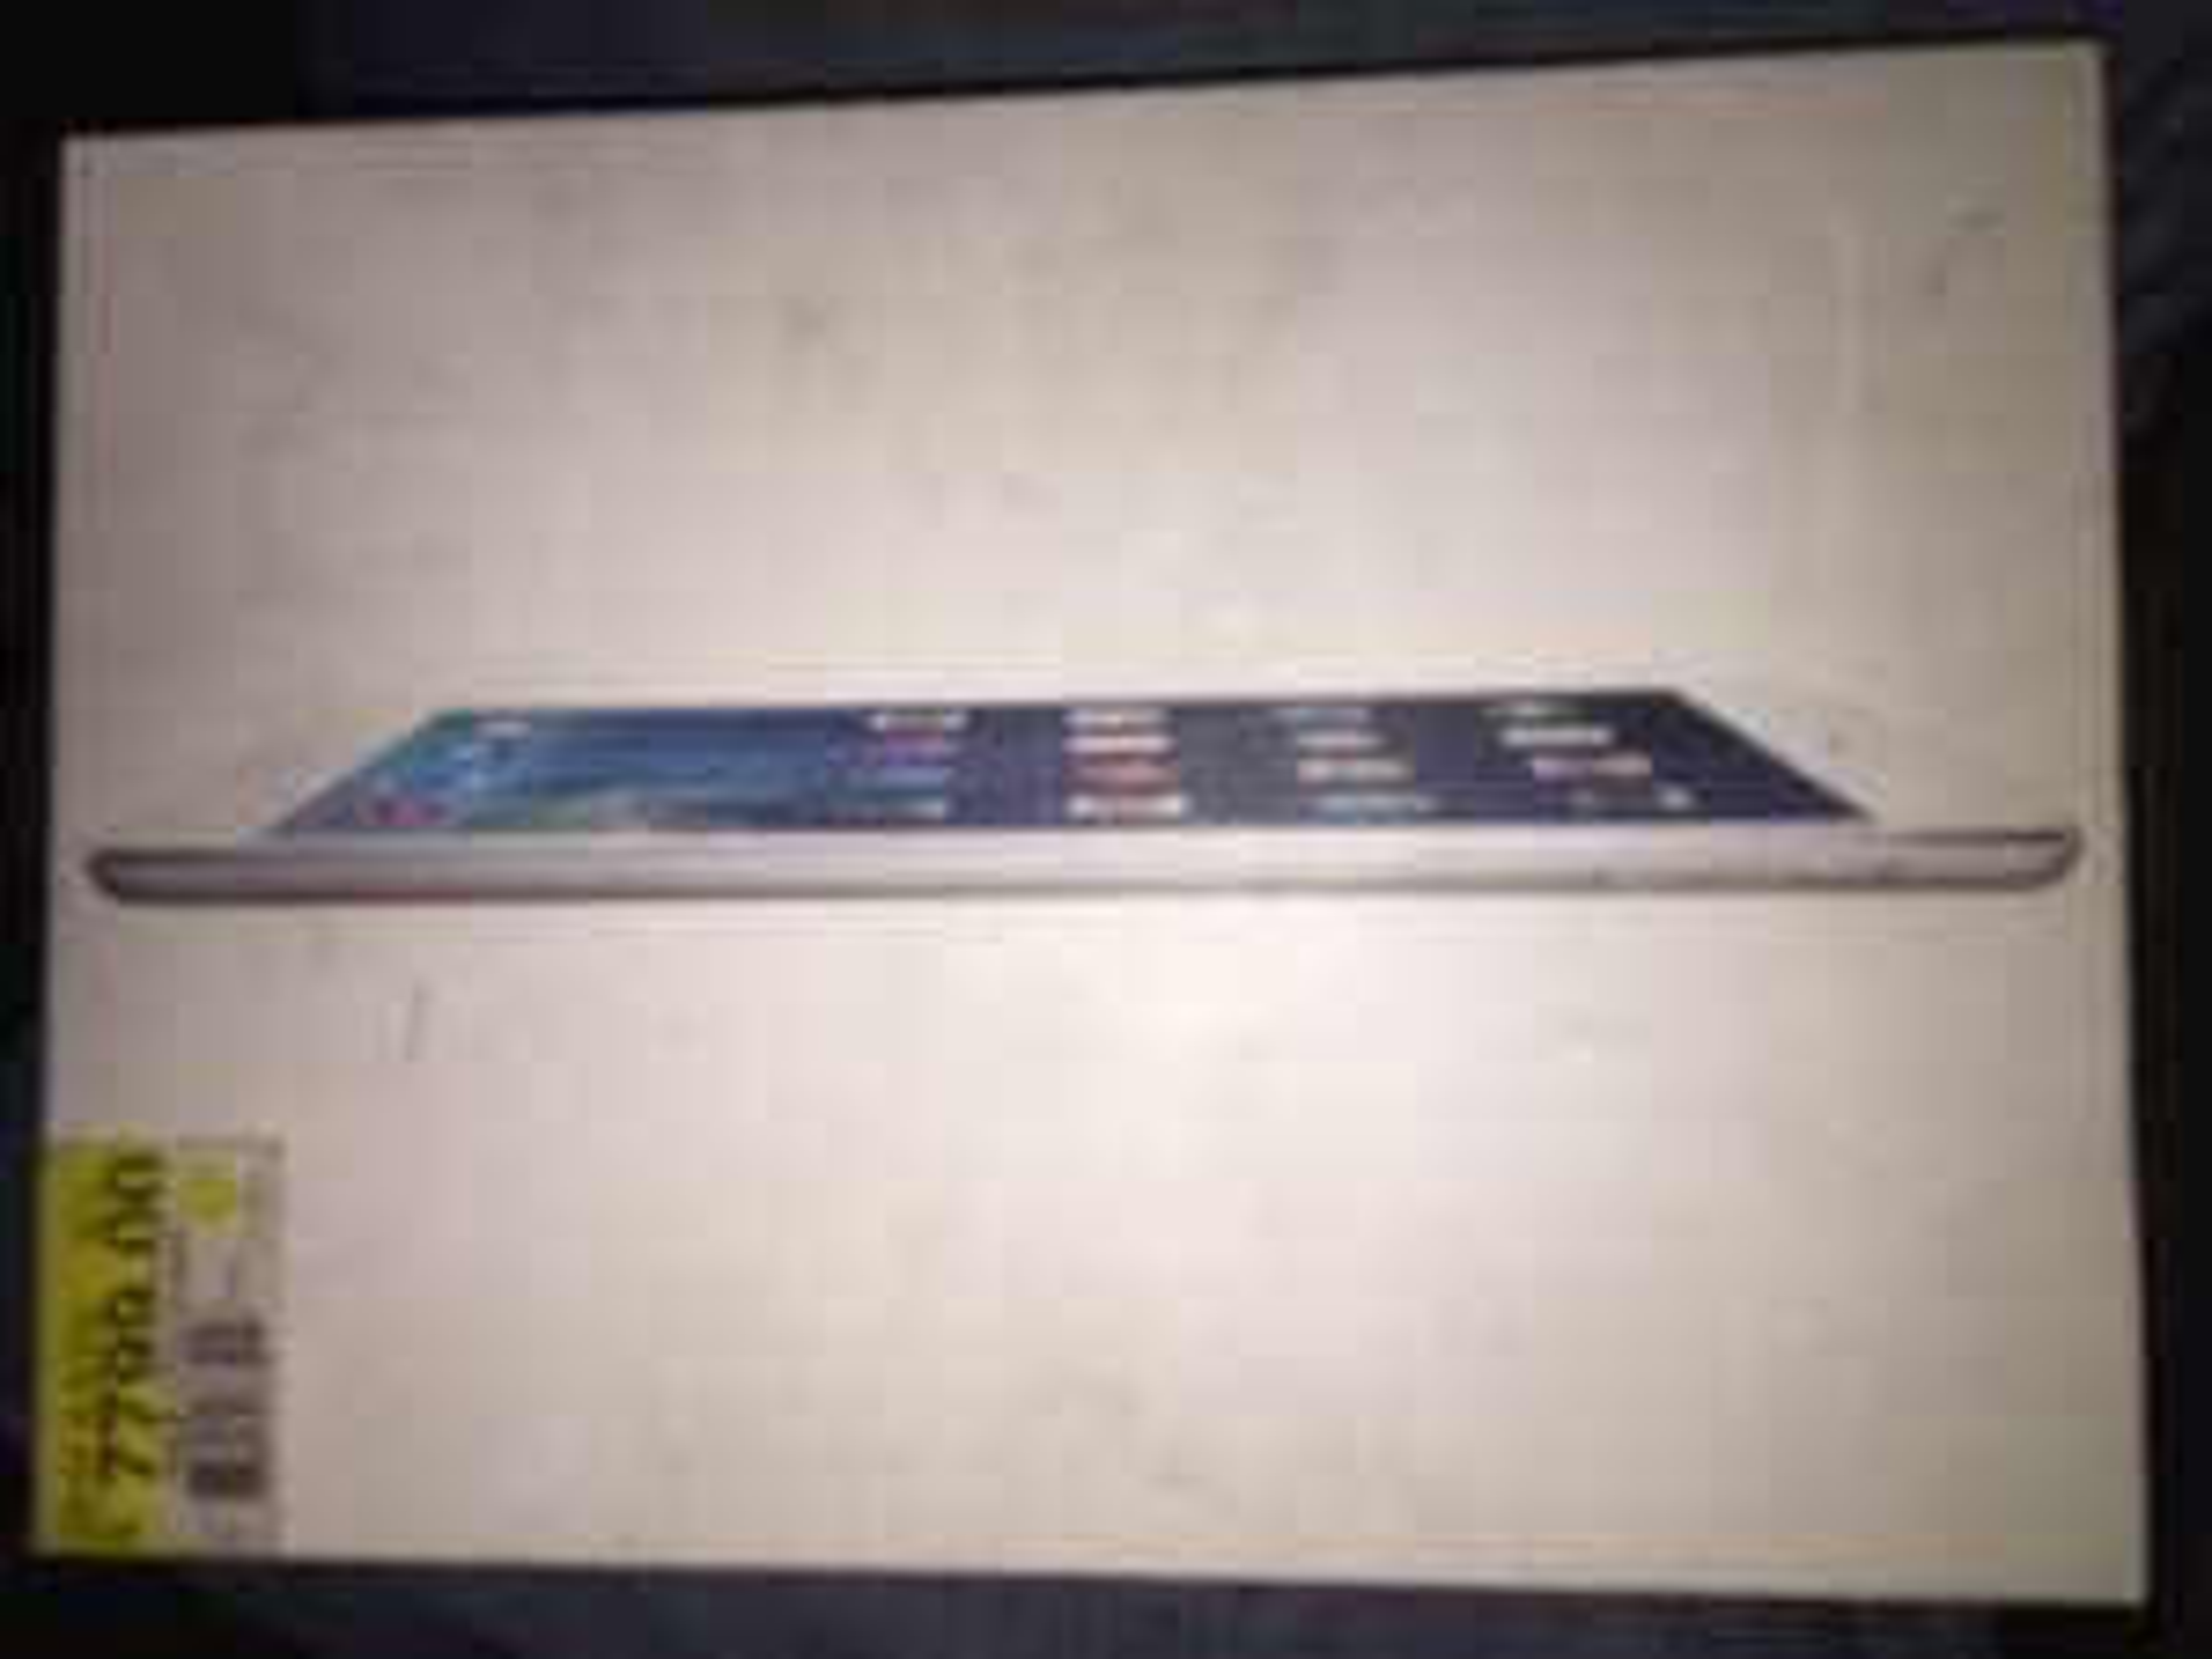 Walmart Cd. Jardin: iPad Air 1 de 16GB a $3,849